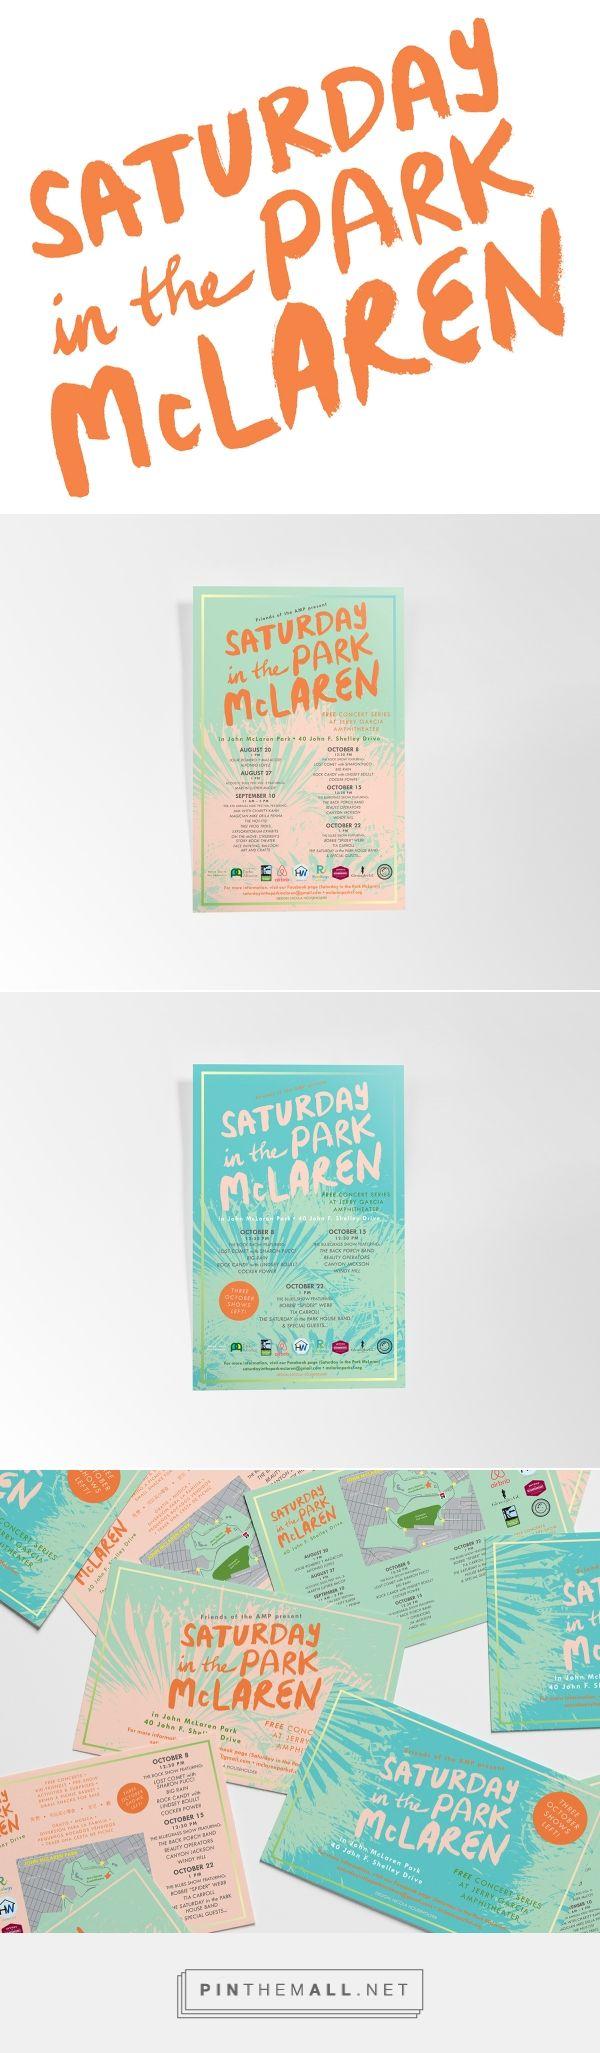 Saturday in the Park McLaren Music Festival Branding by Nicola Householder | Fivestar Branding Agency – Design and Branding Agency & Inspiration Gallery